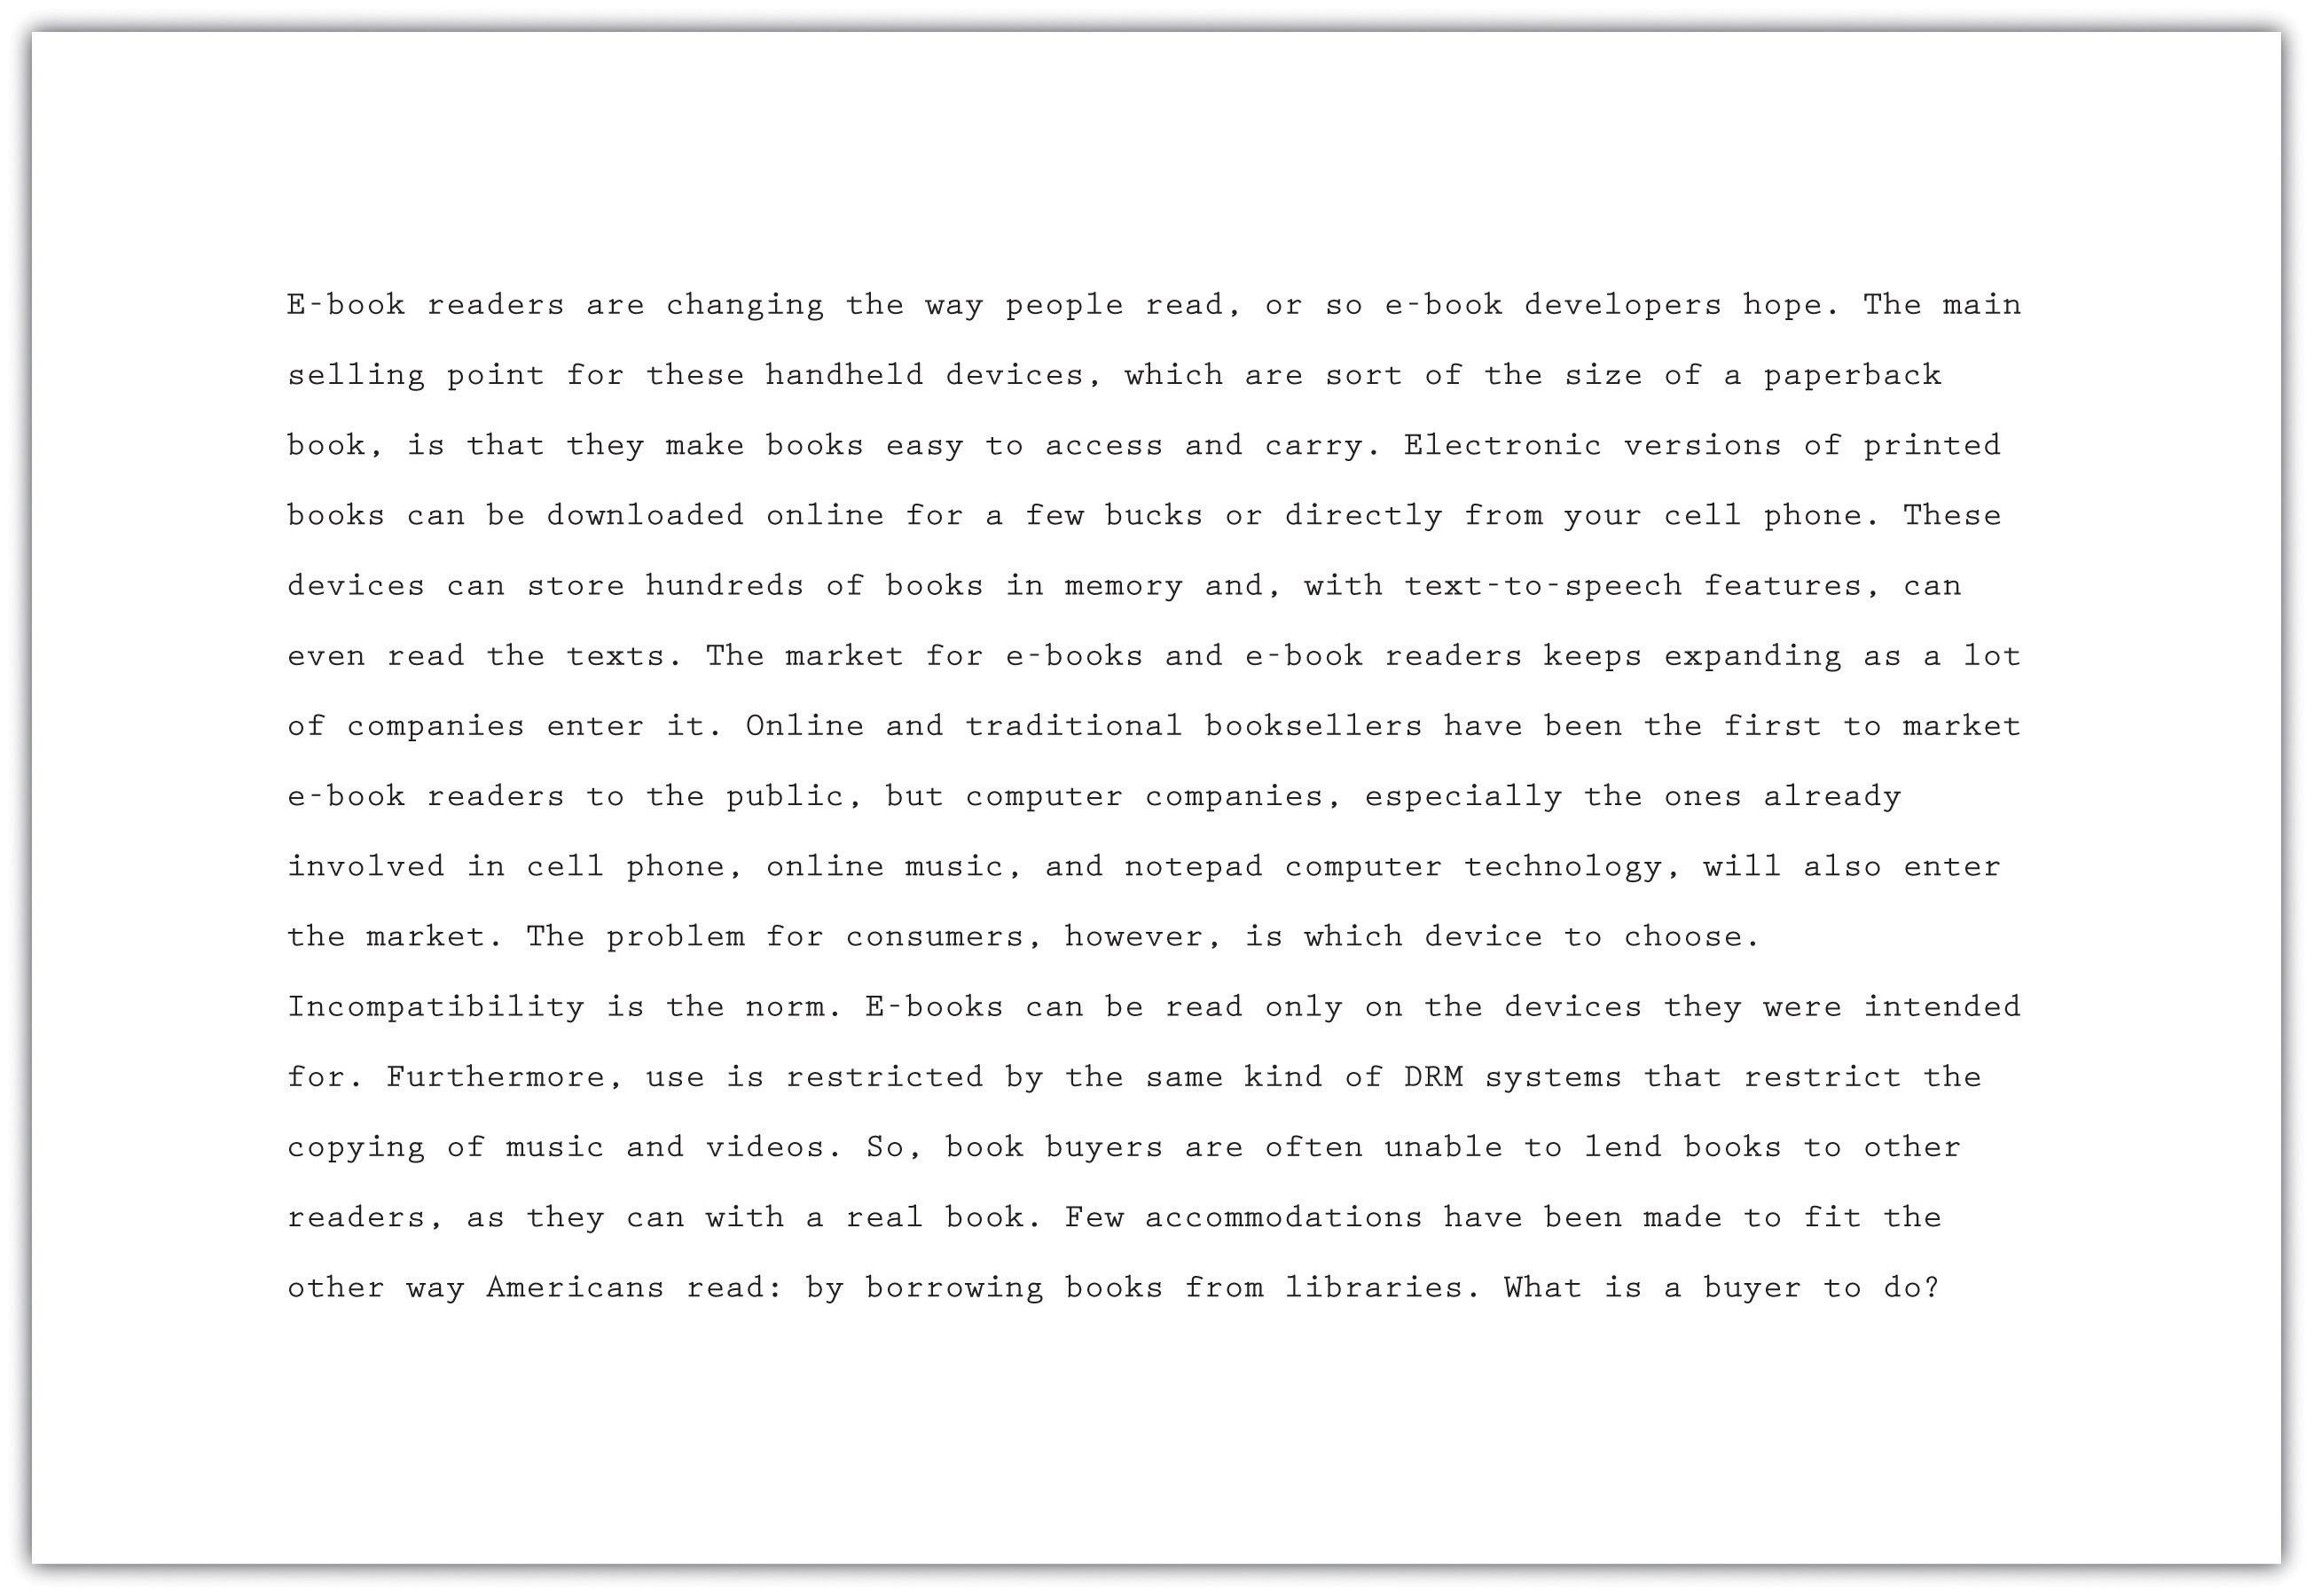 013 Interesting Persuasive Essay Topics Unforgettable Argumentative For High School Students Funny Speech Full